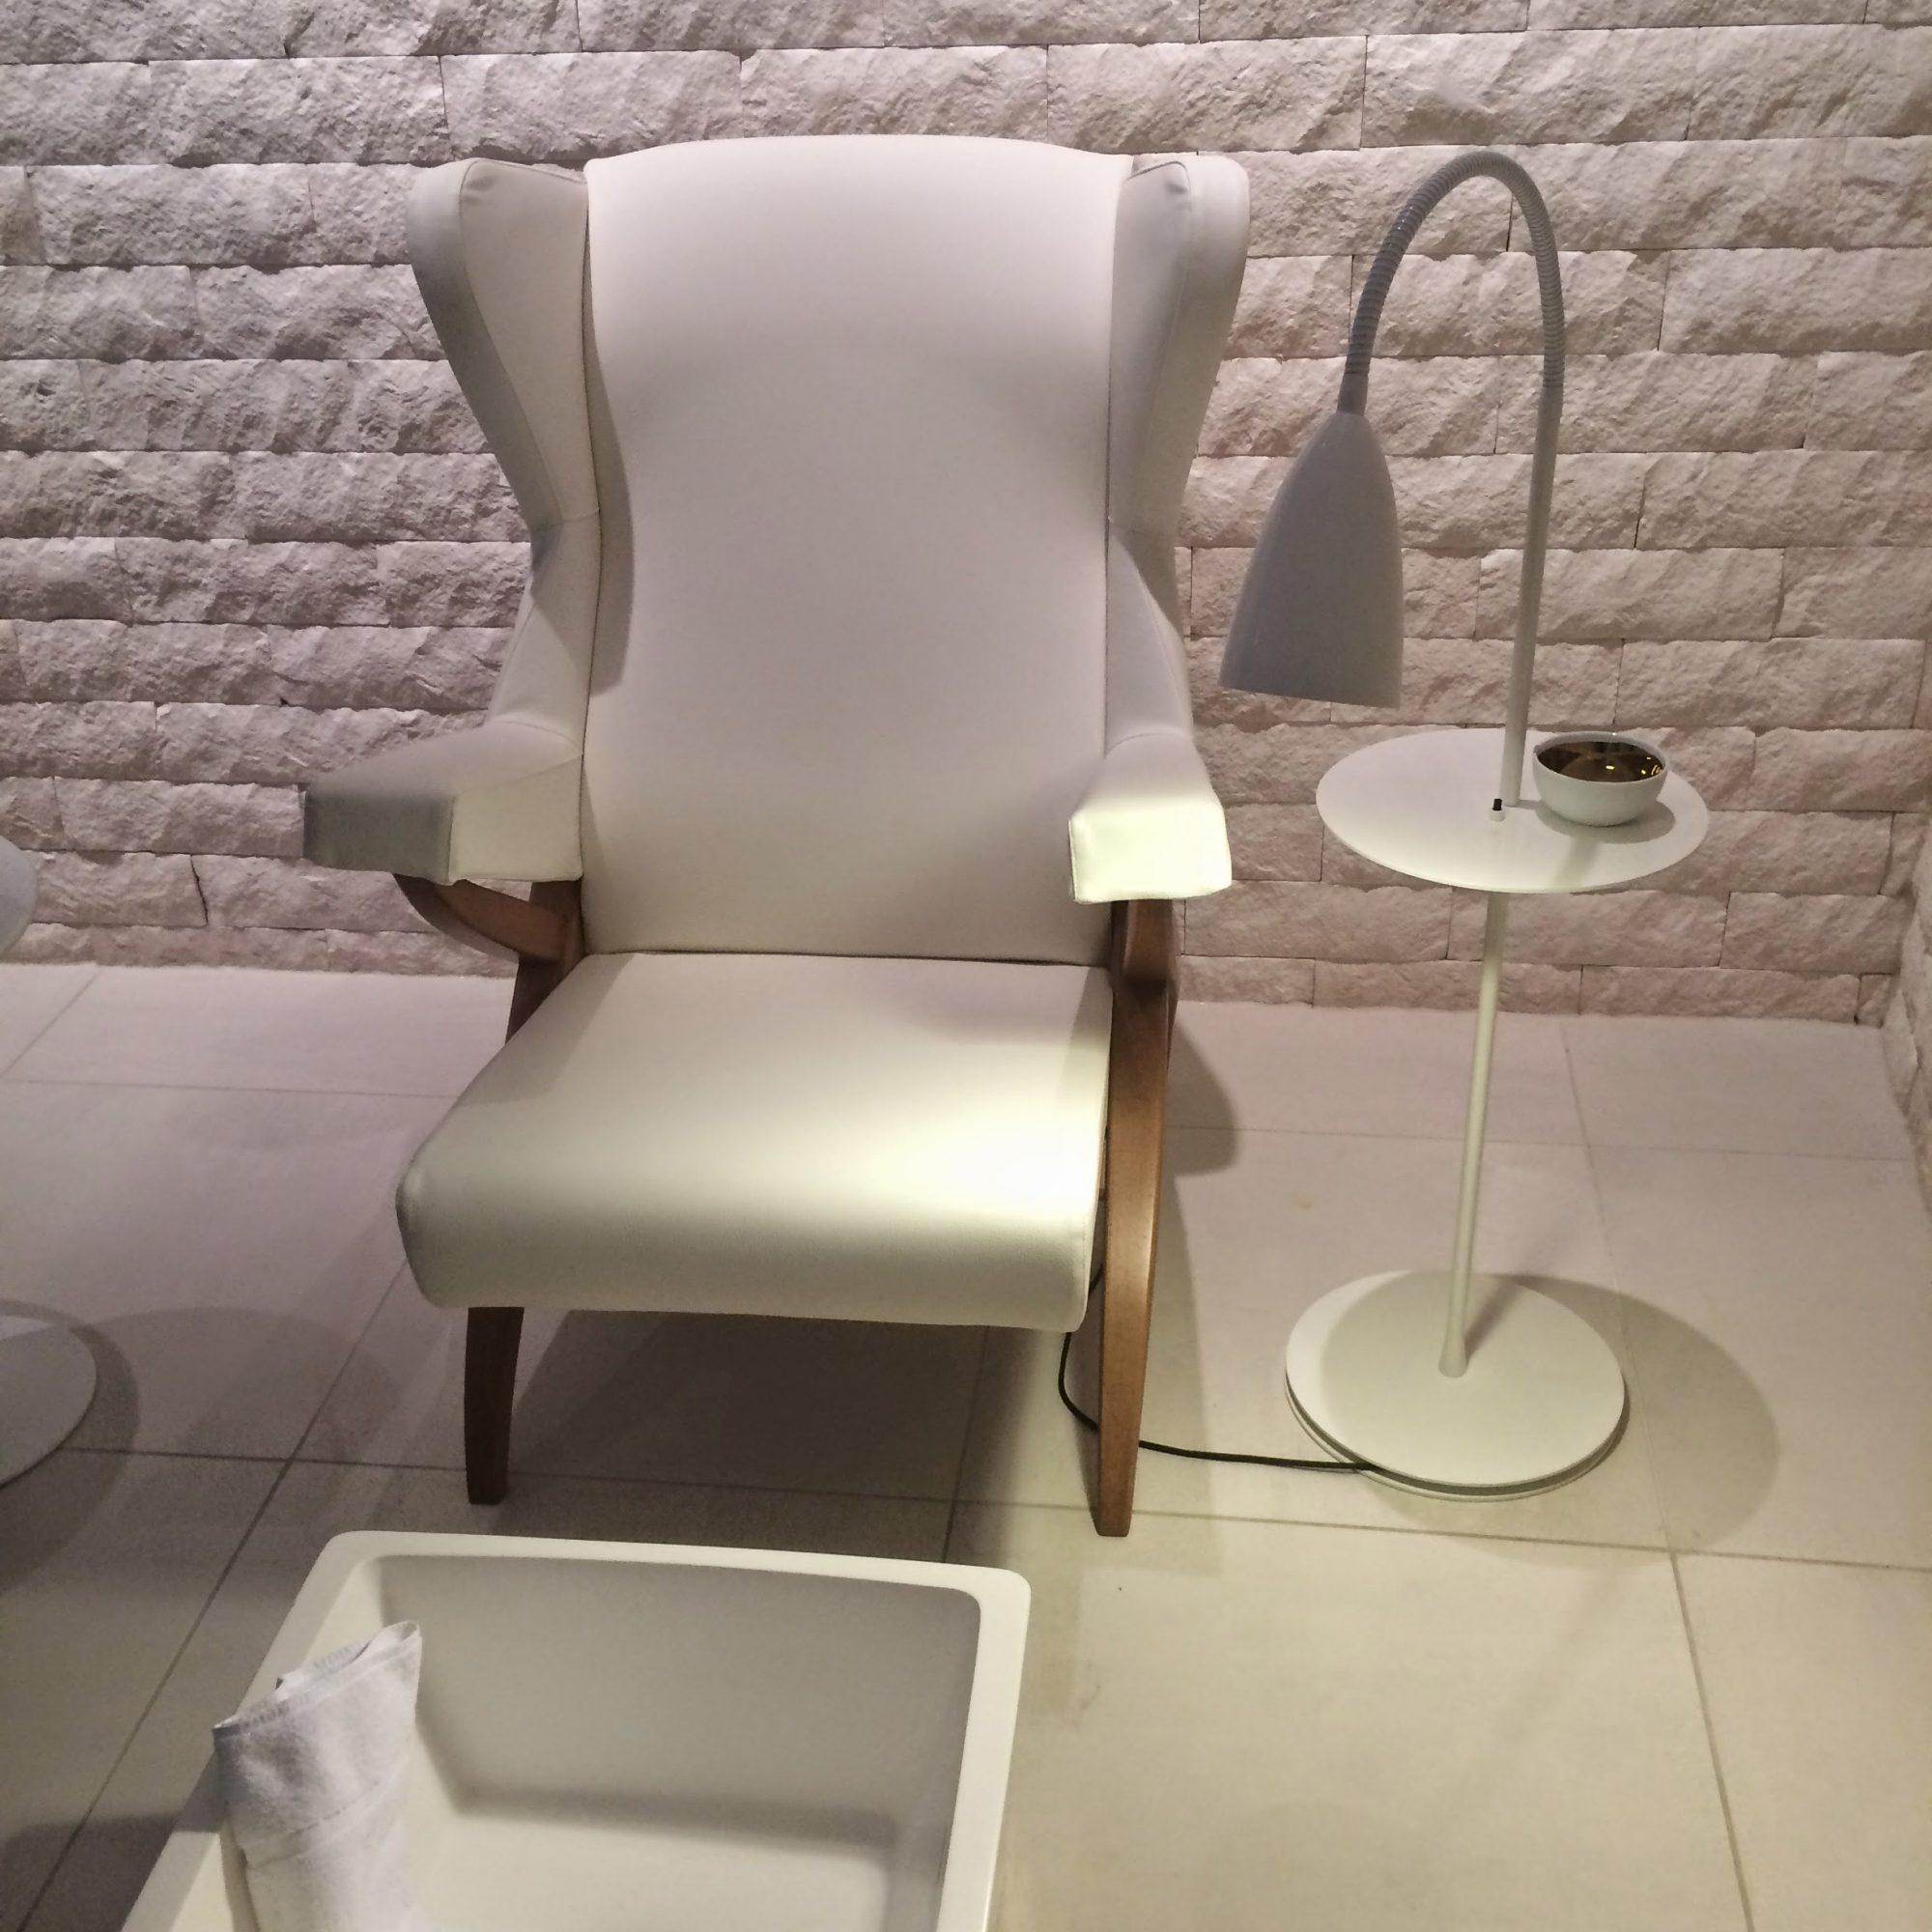 Mondrian_Sea-Containers_agua-spa-bathhouse_Glamour-Room-Chair